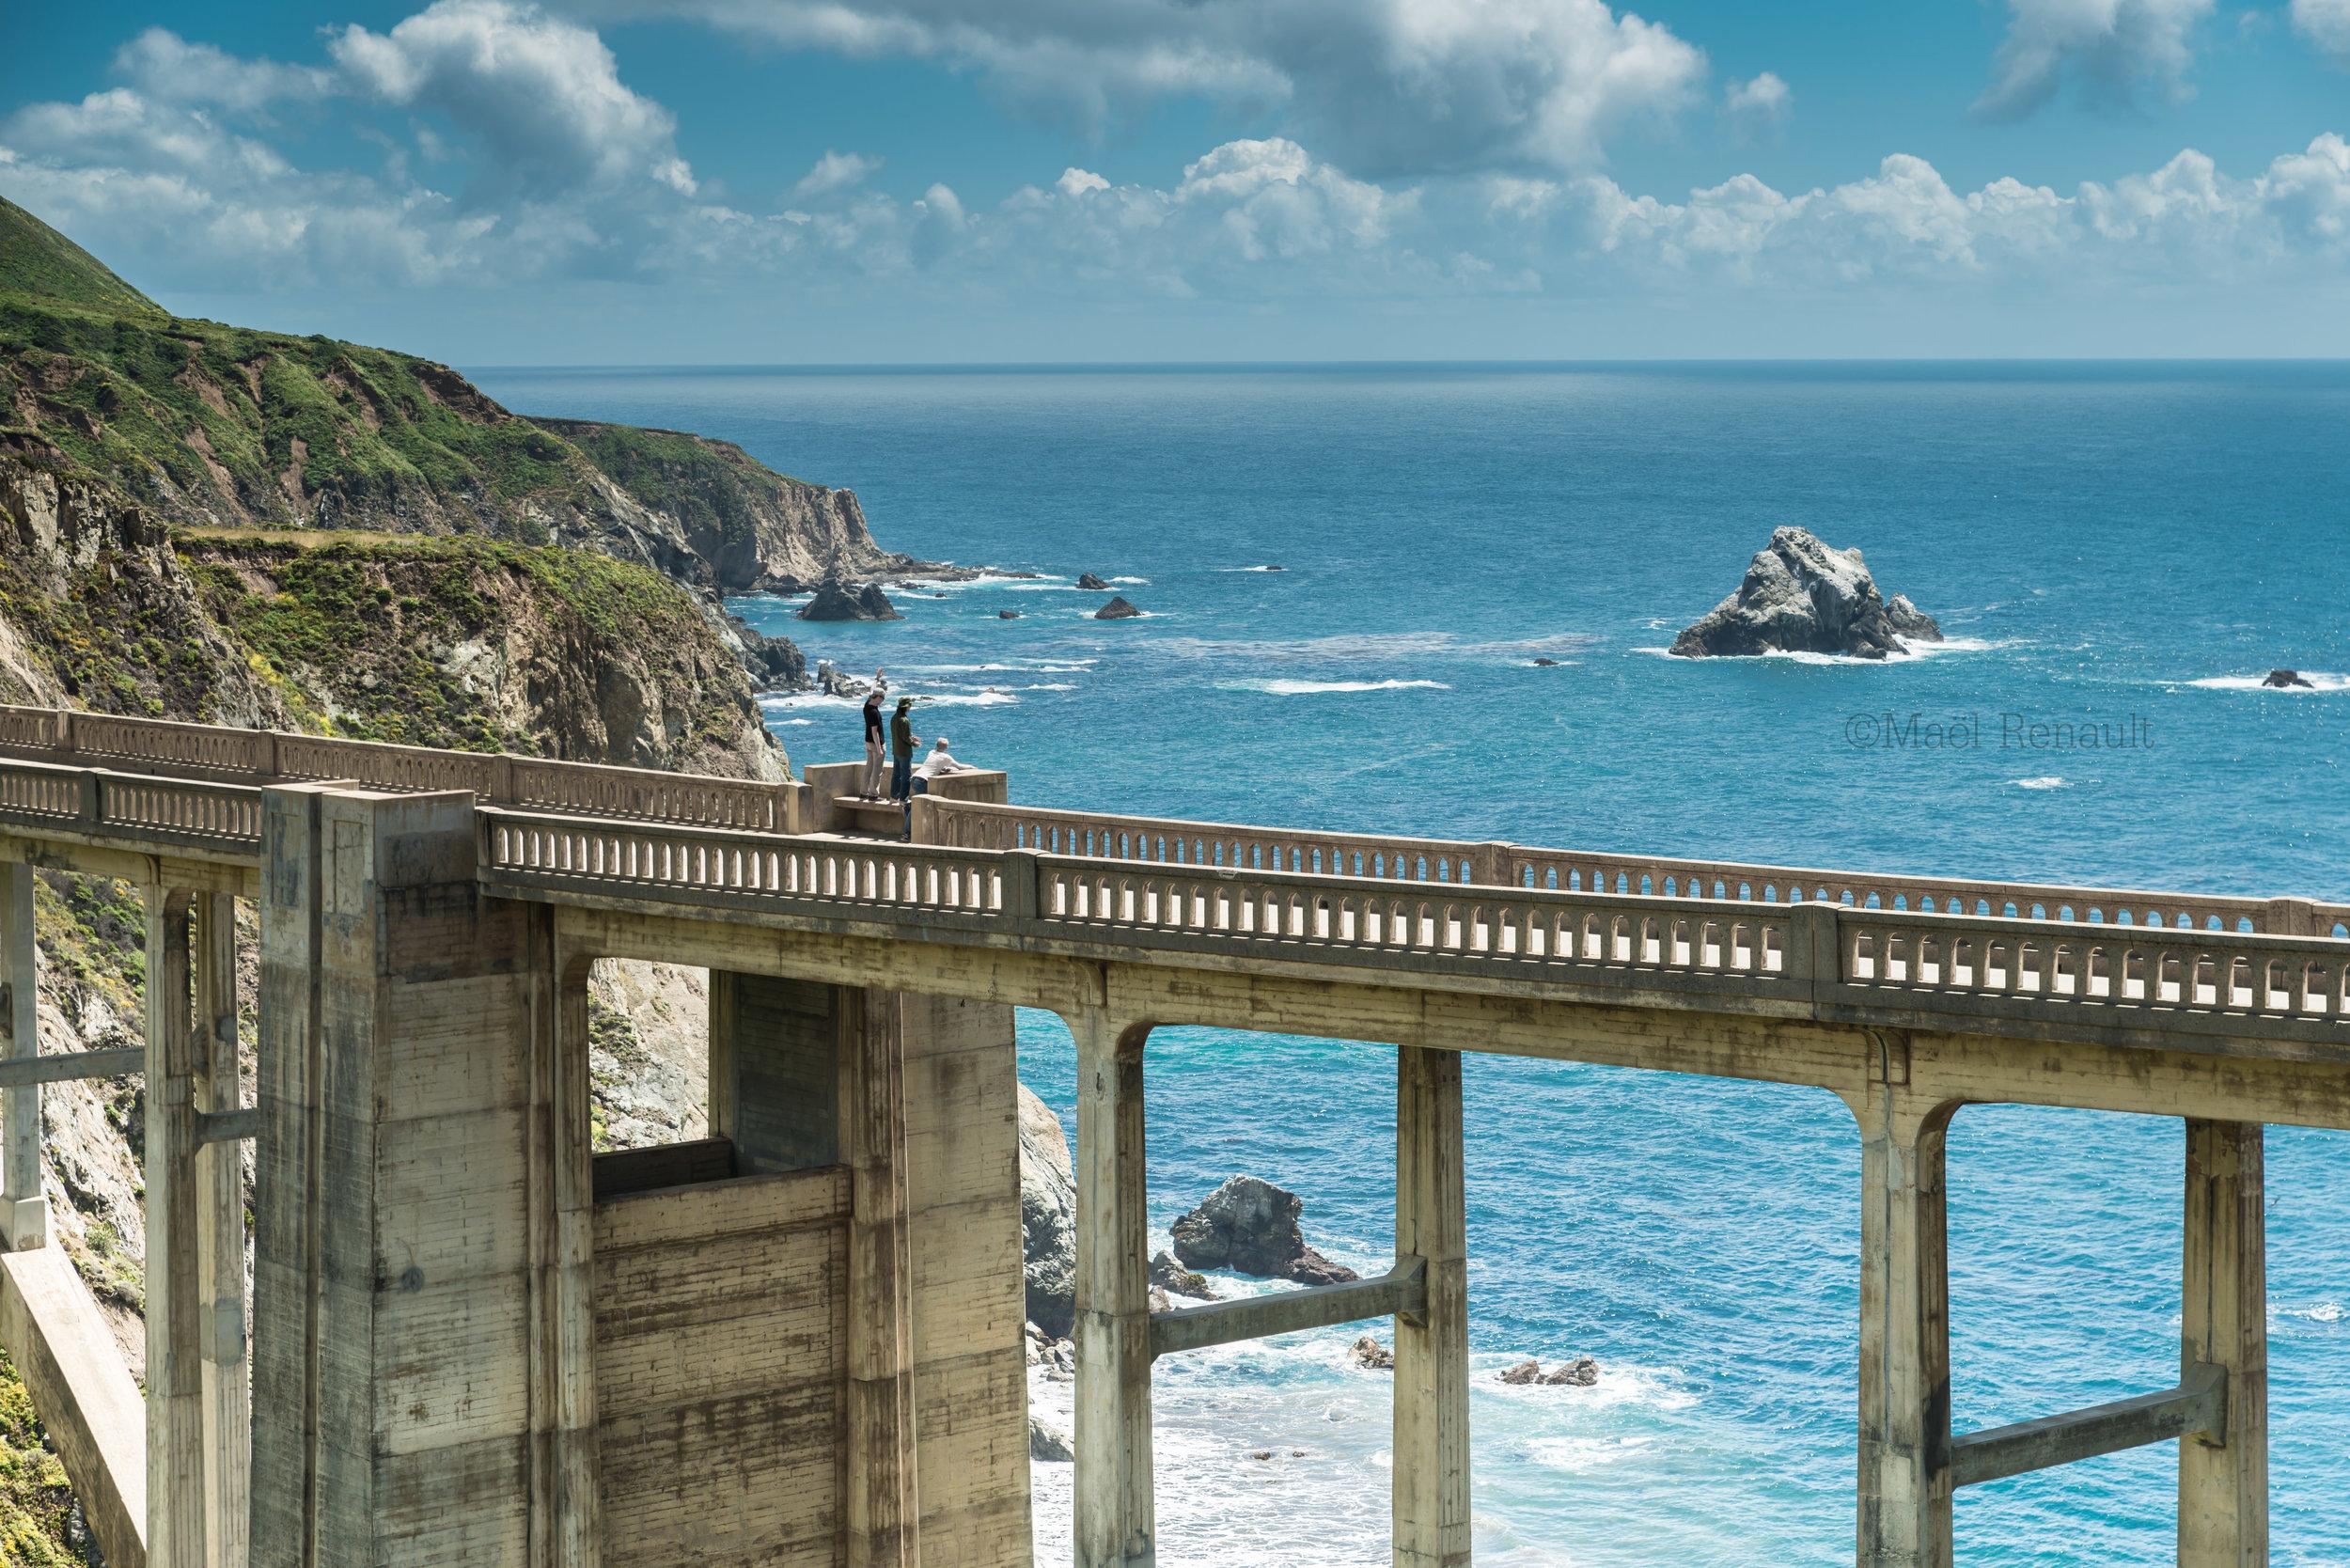 Bixby Bridge / California